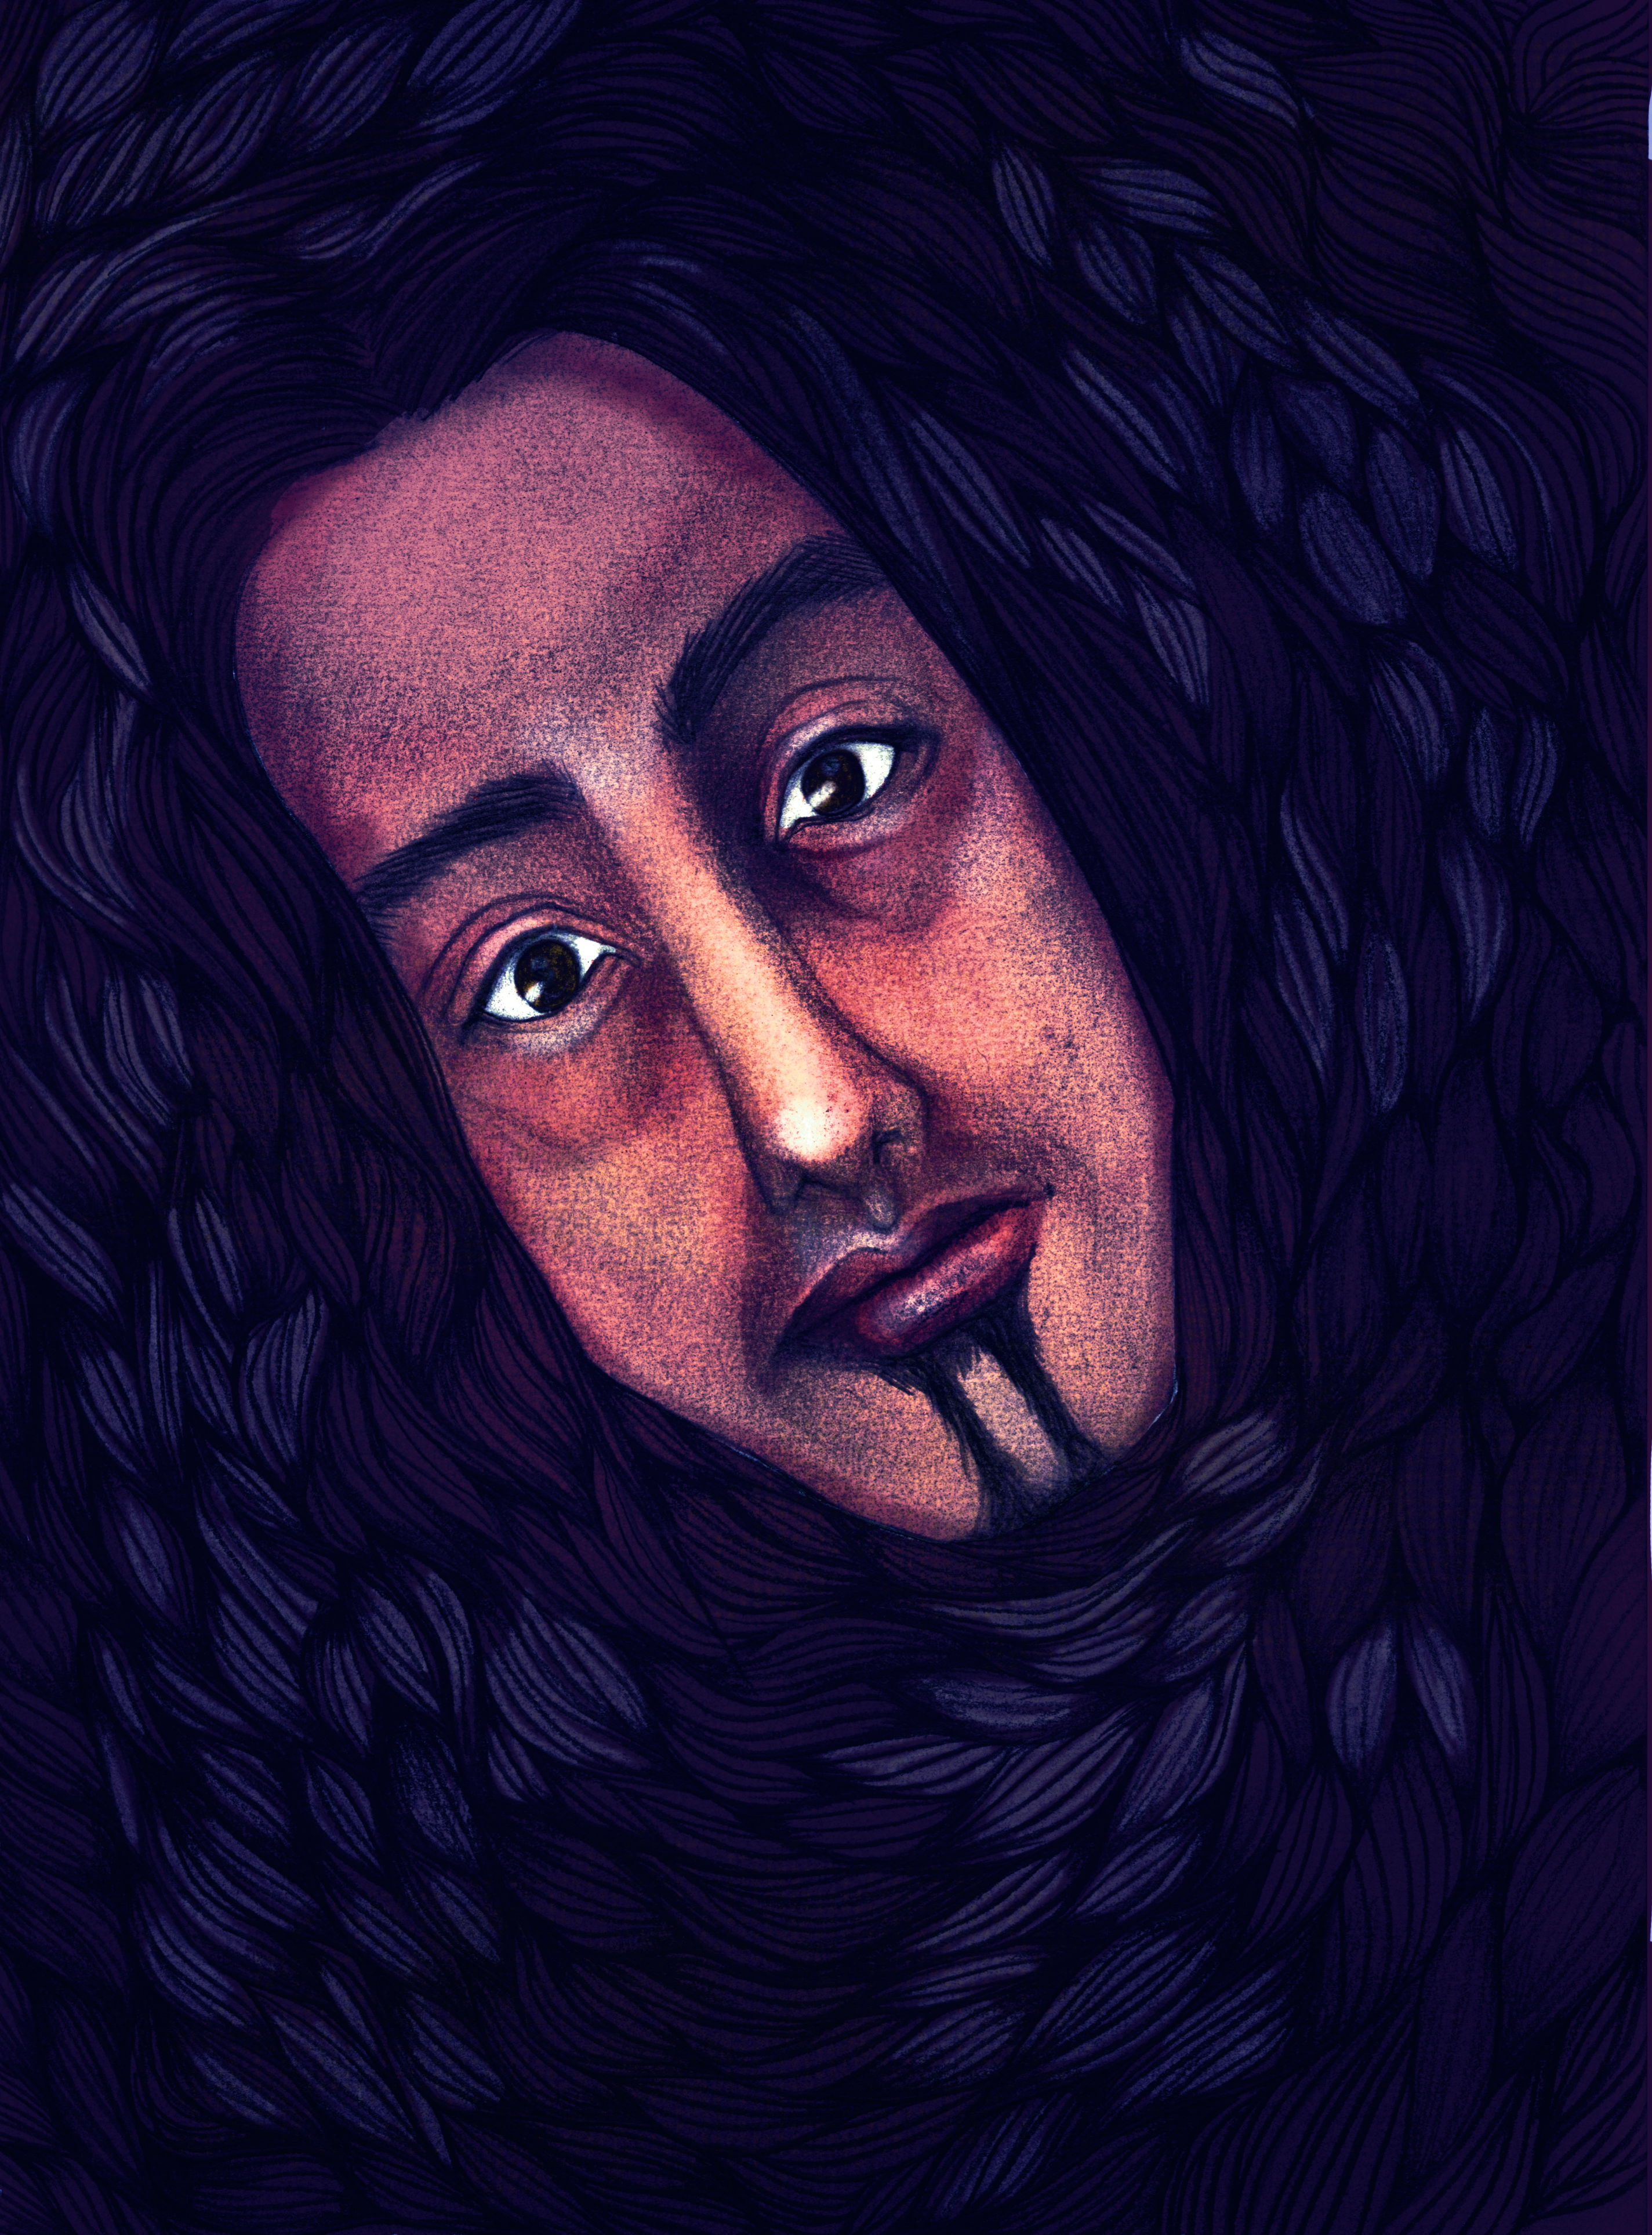 Bassnectar Caricature Portrait